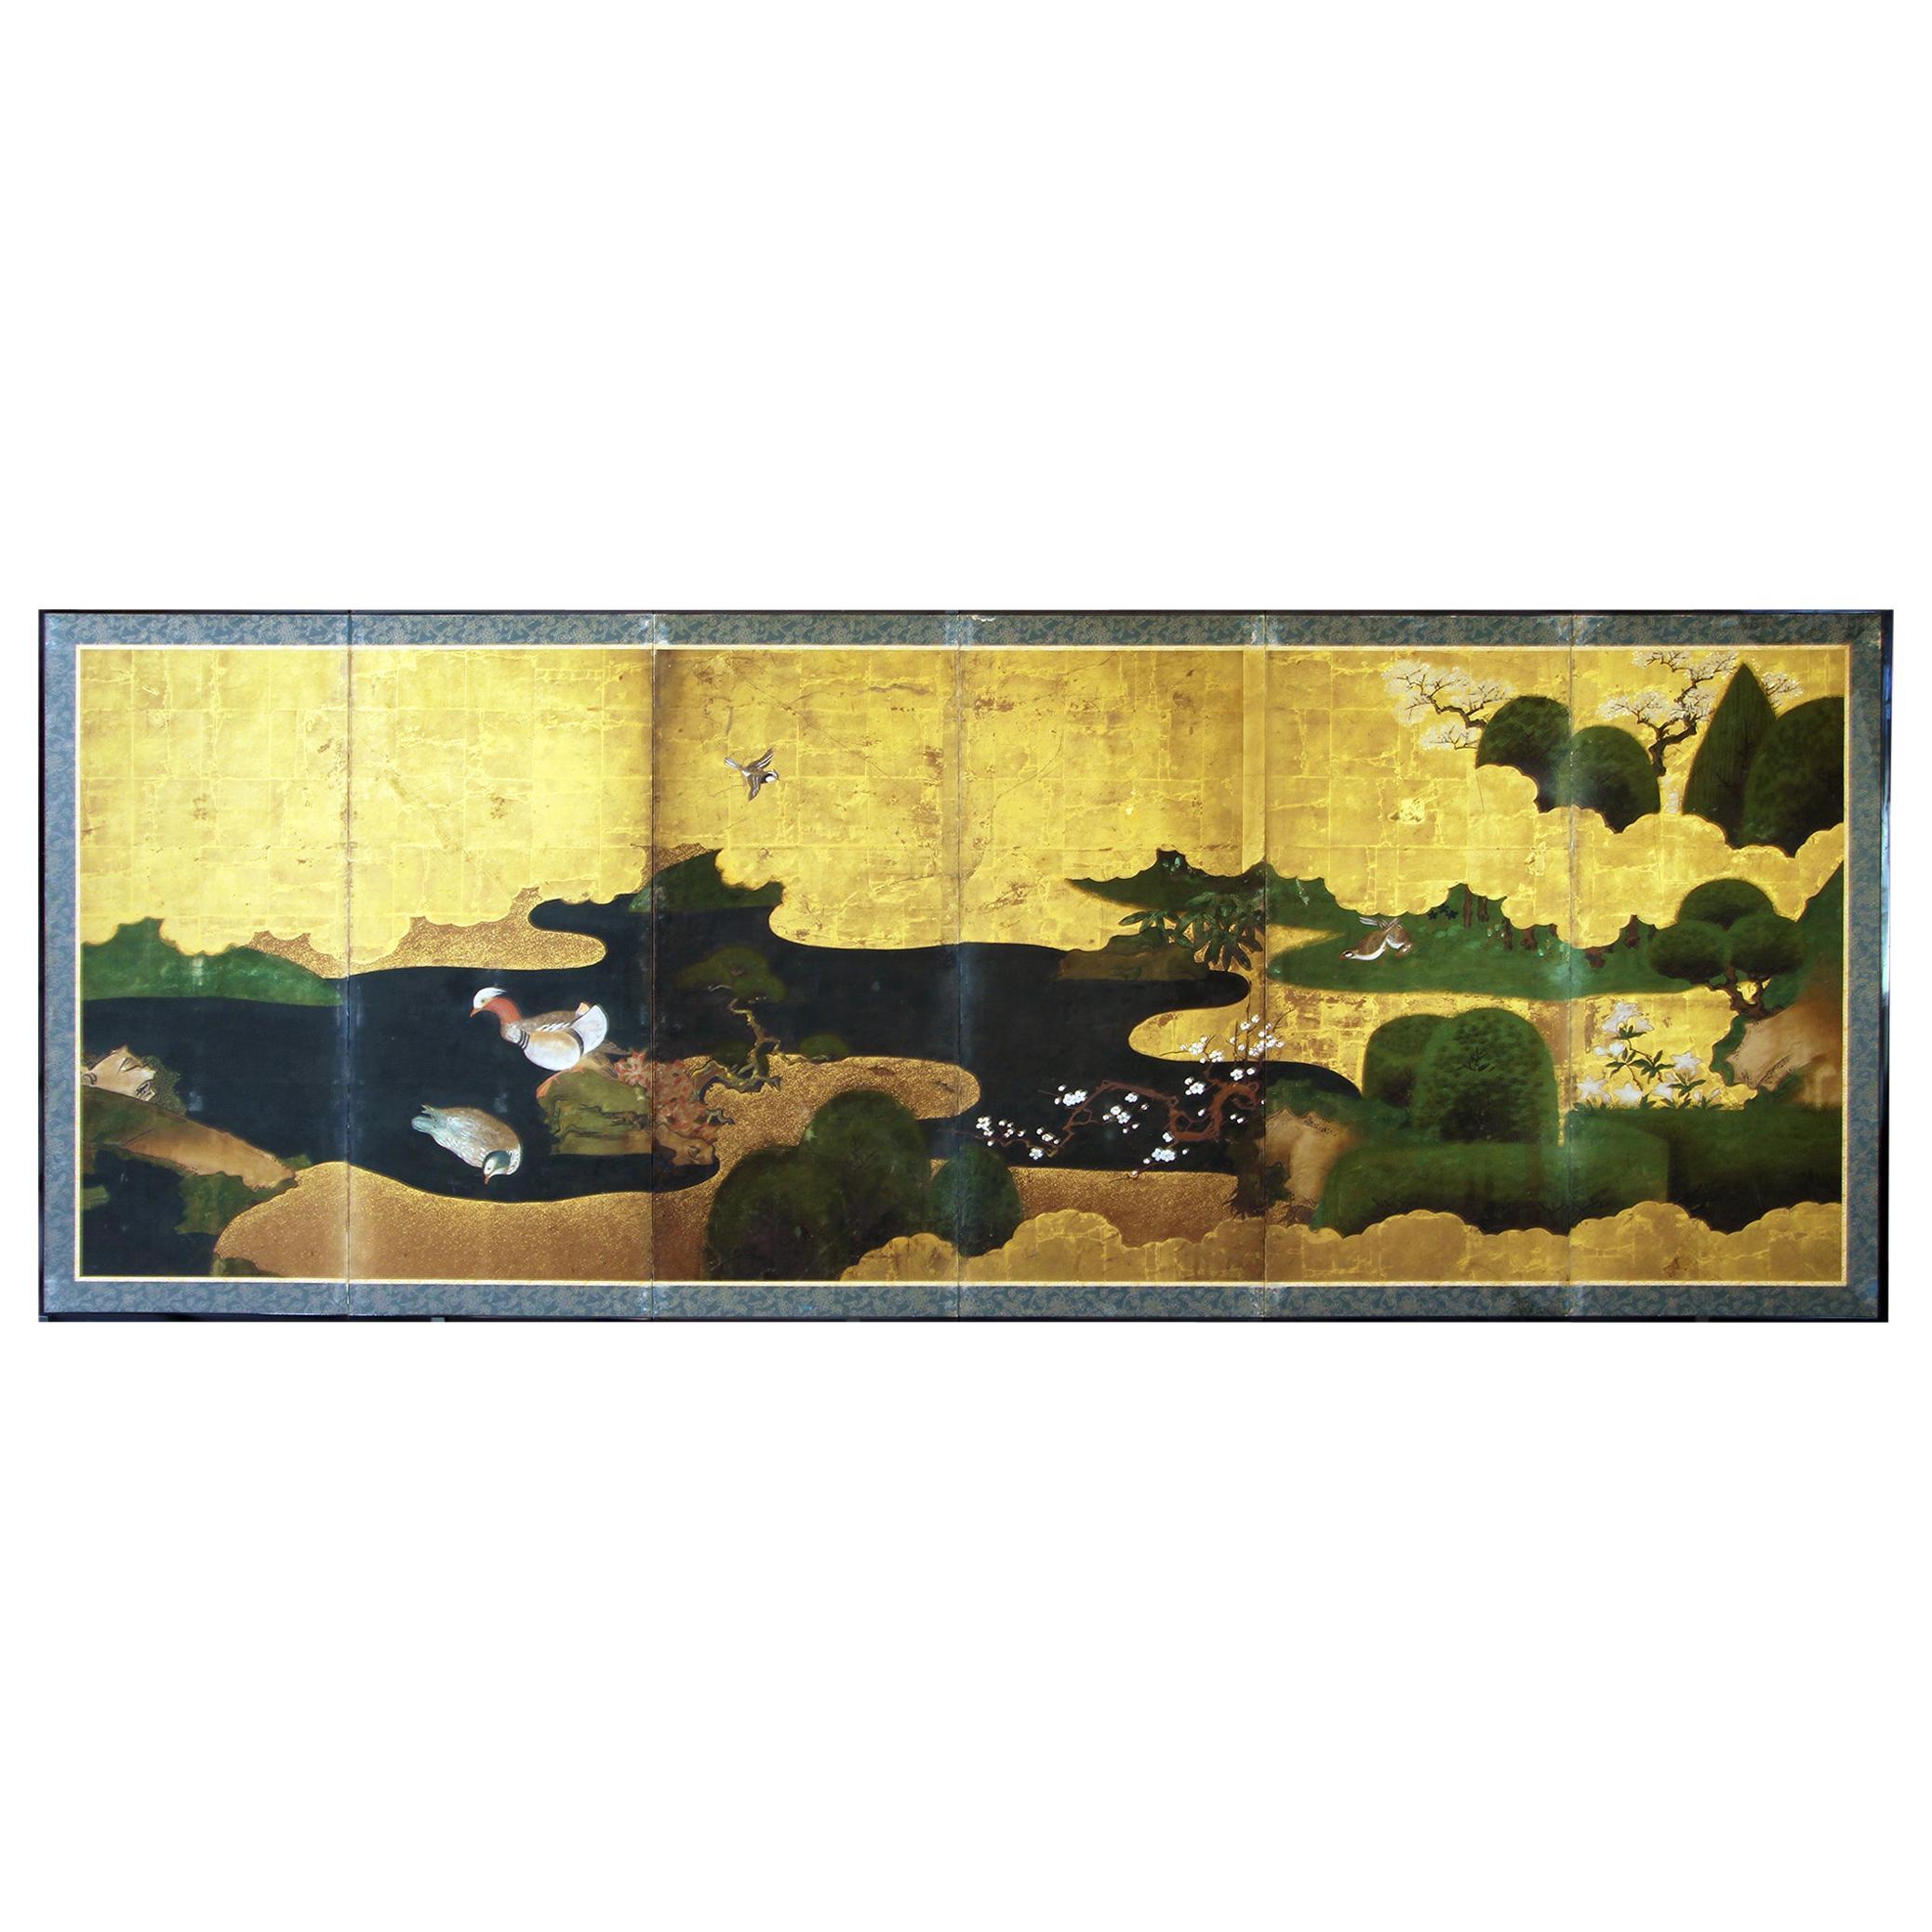 Edo 18th Century Japanese Folding Screen Six Panels Golden Leaf Mandarina Duck